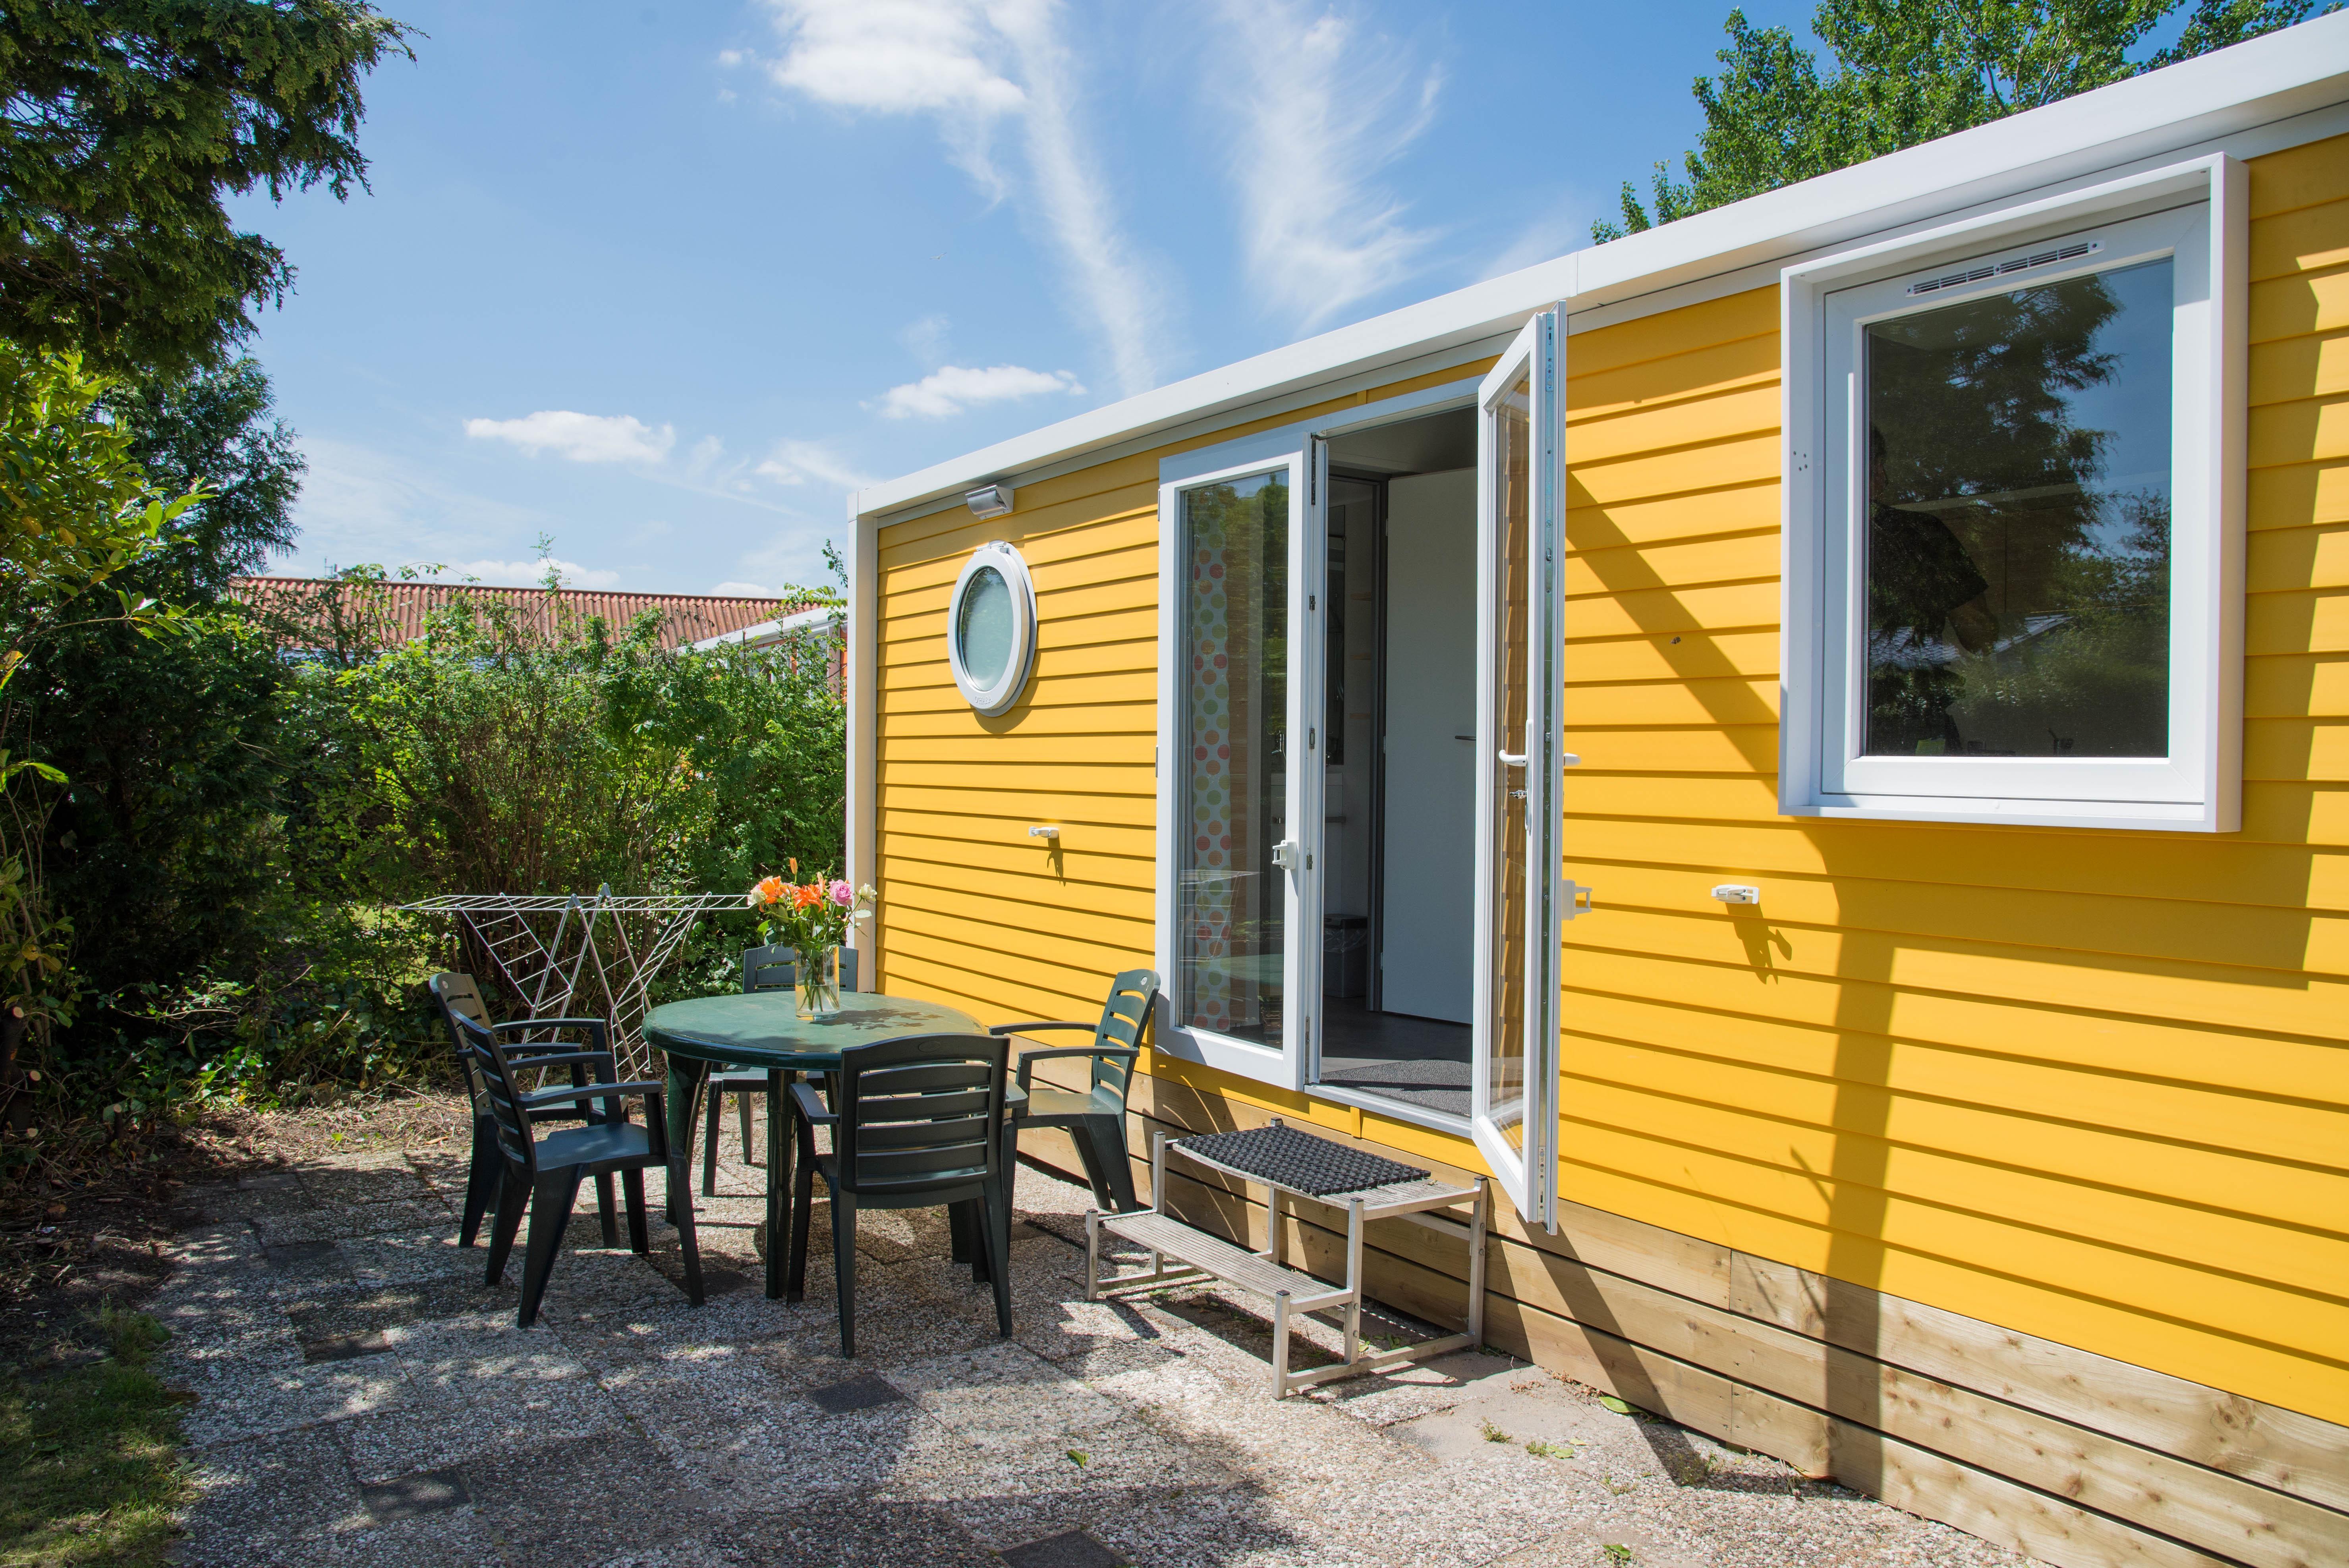 Location - Chalet 5 - Max 5 Pers. - Vakantiepark Koningshof